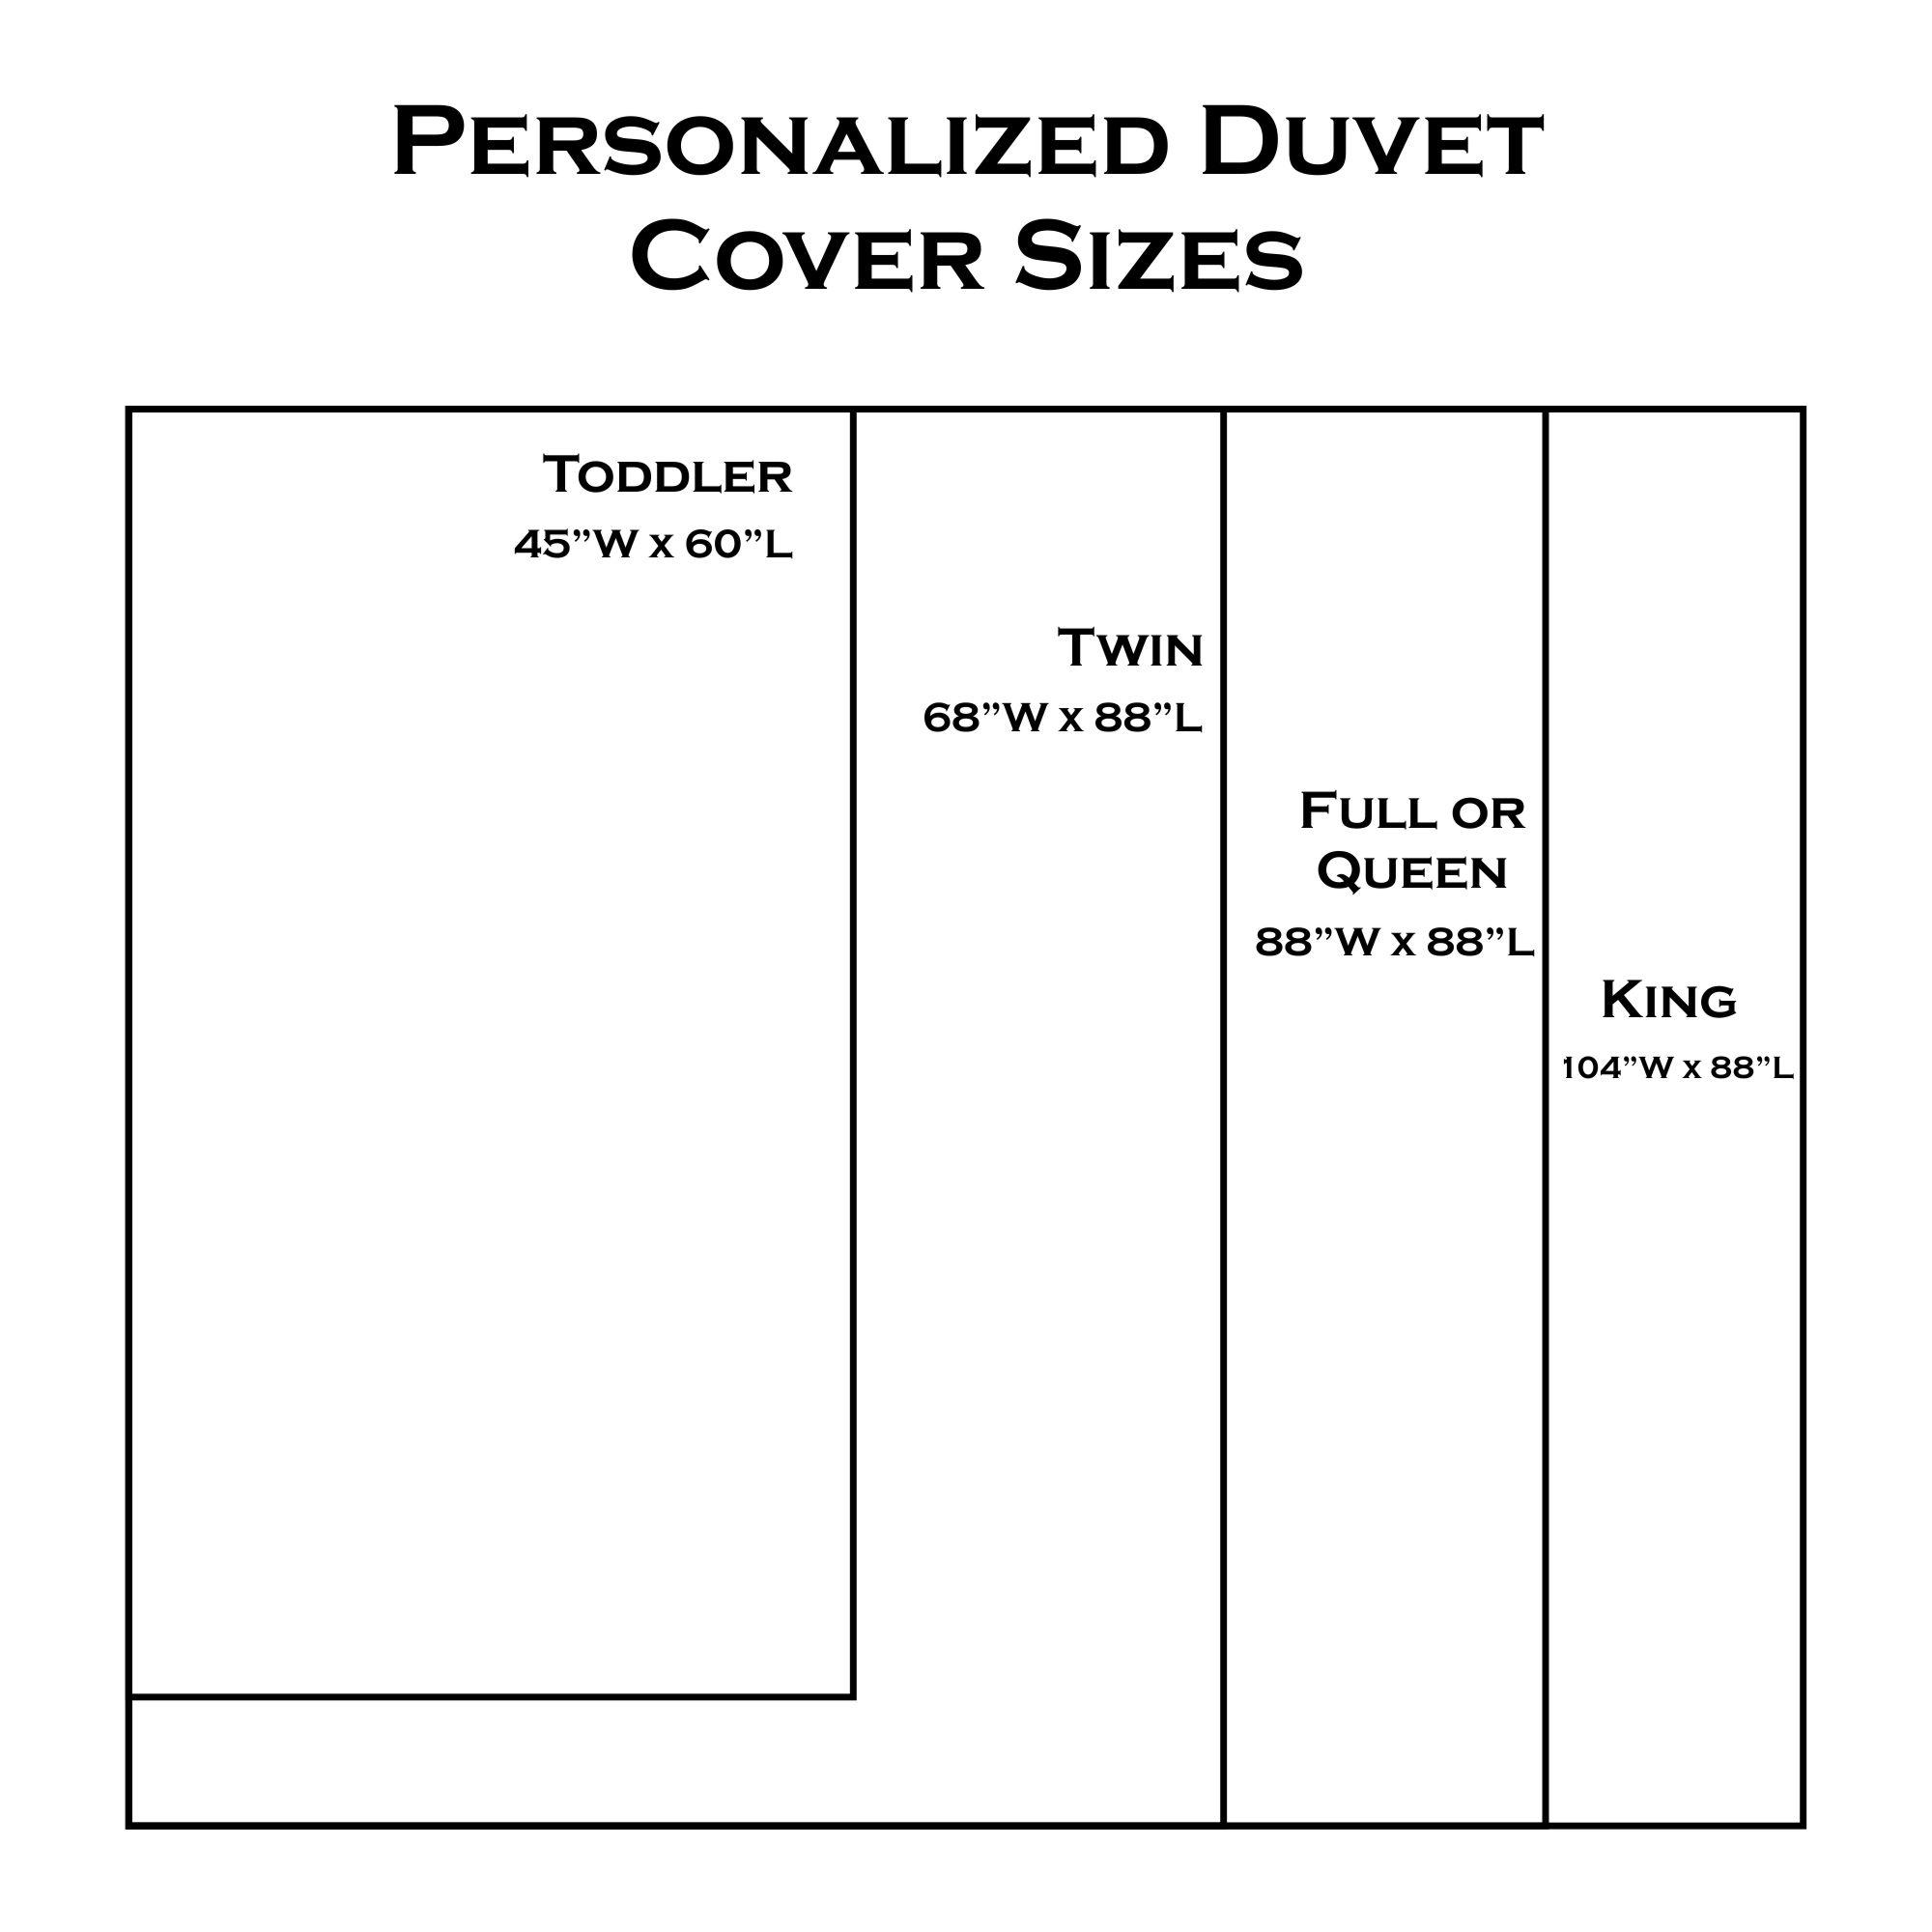 full size duvet cover Circuit Board Duvet Cover (Personalized)   YouCustomizeIt full size duvet cover